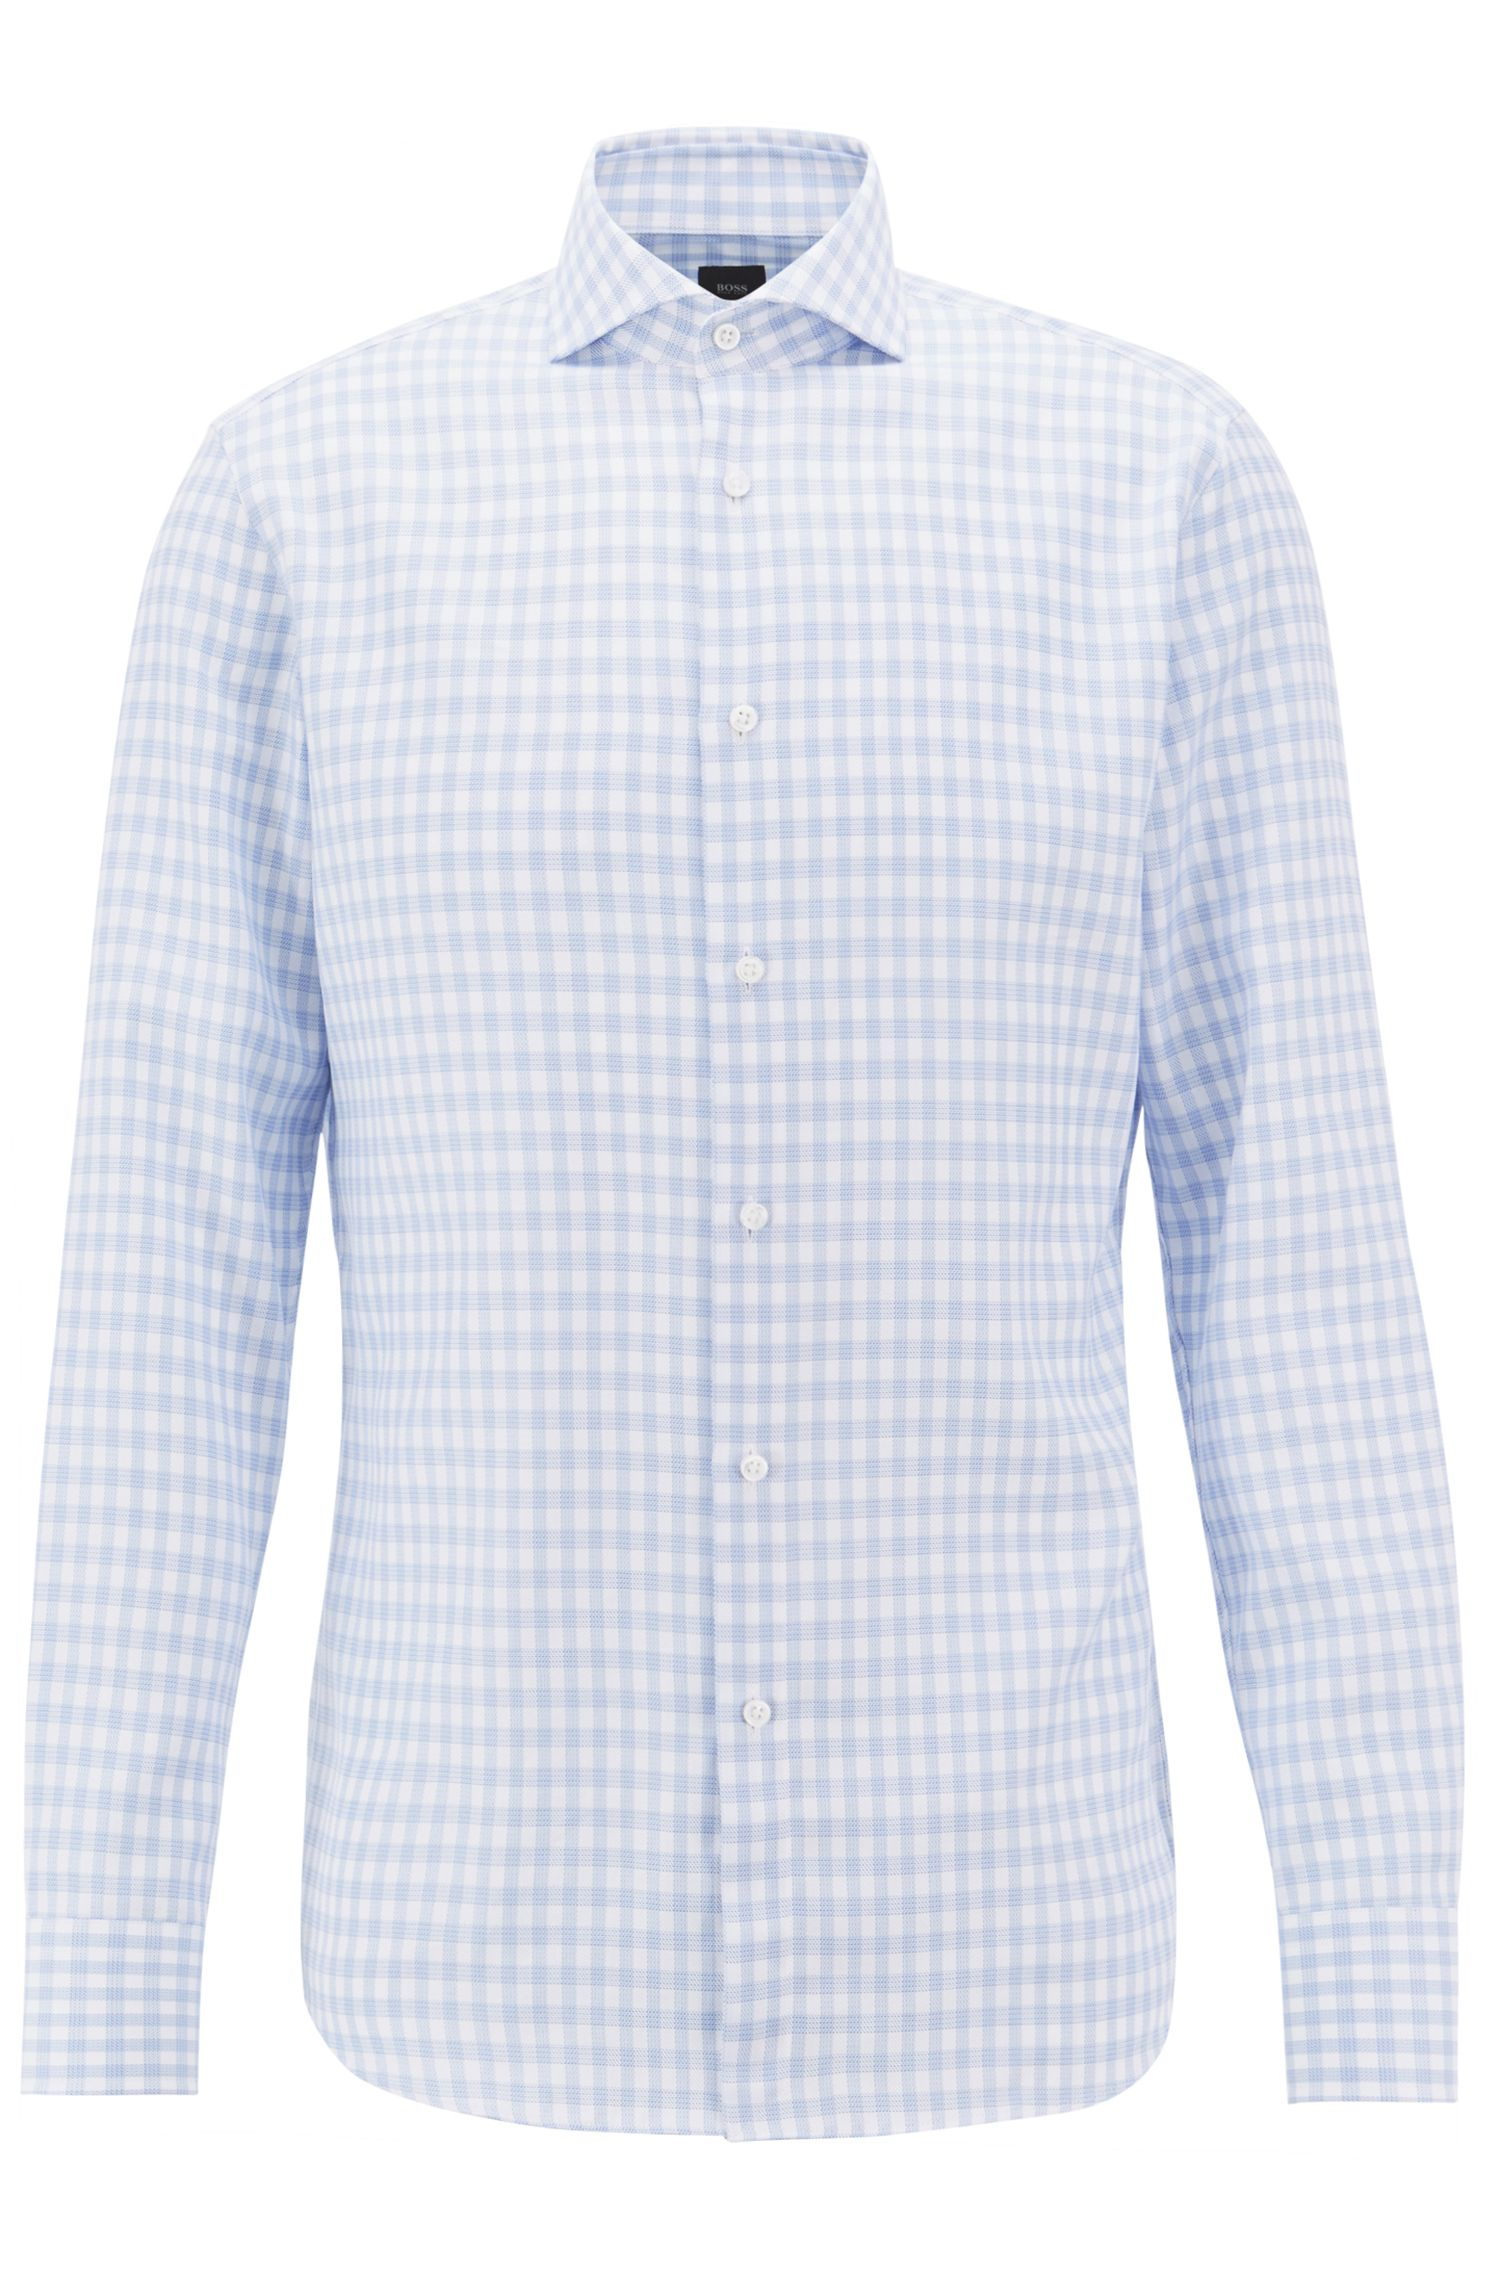 BOSS Tailored slim-fit shirt in Glen-check cotton, Light Blue